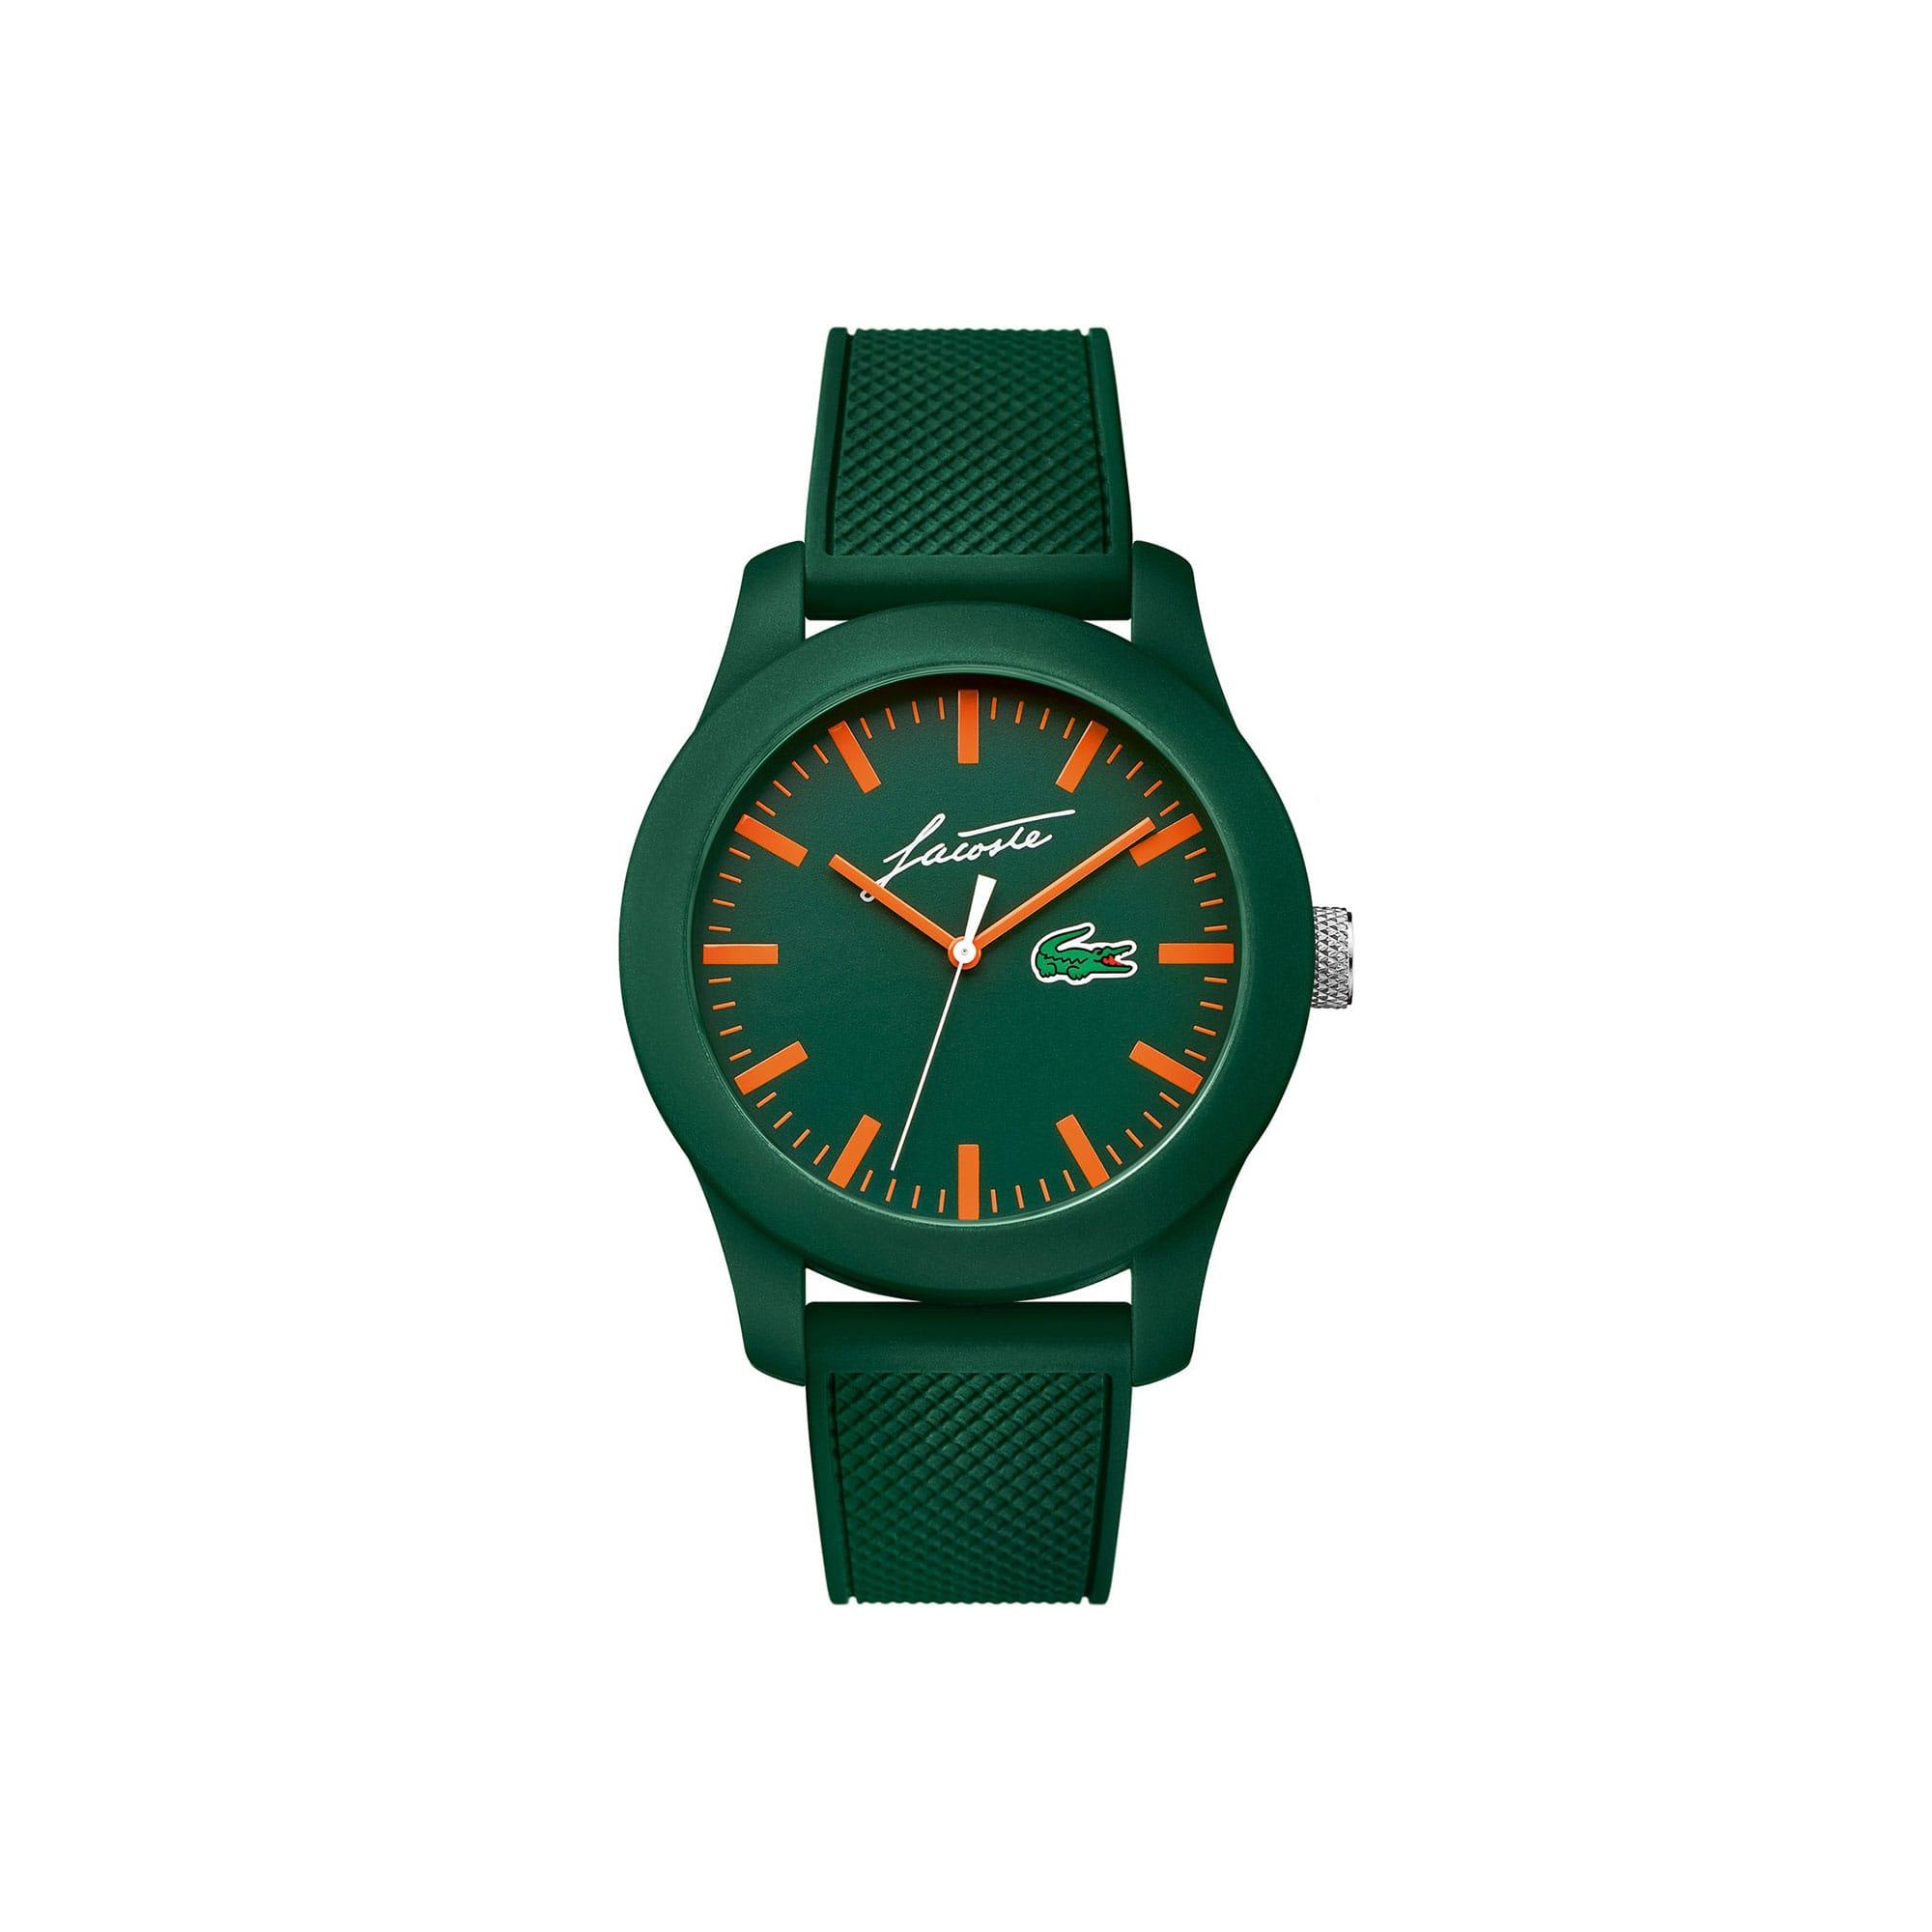 Uhr Lacoste 12.12 mit grünem Silikonarmband und Signatur René Lacoste